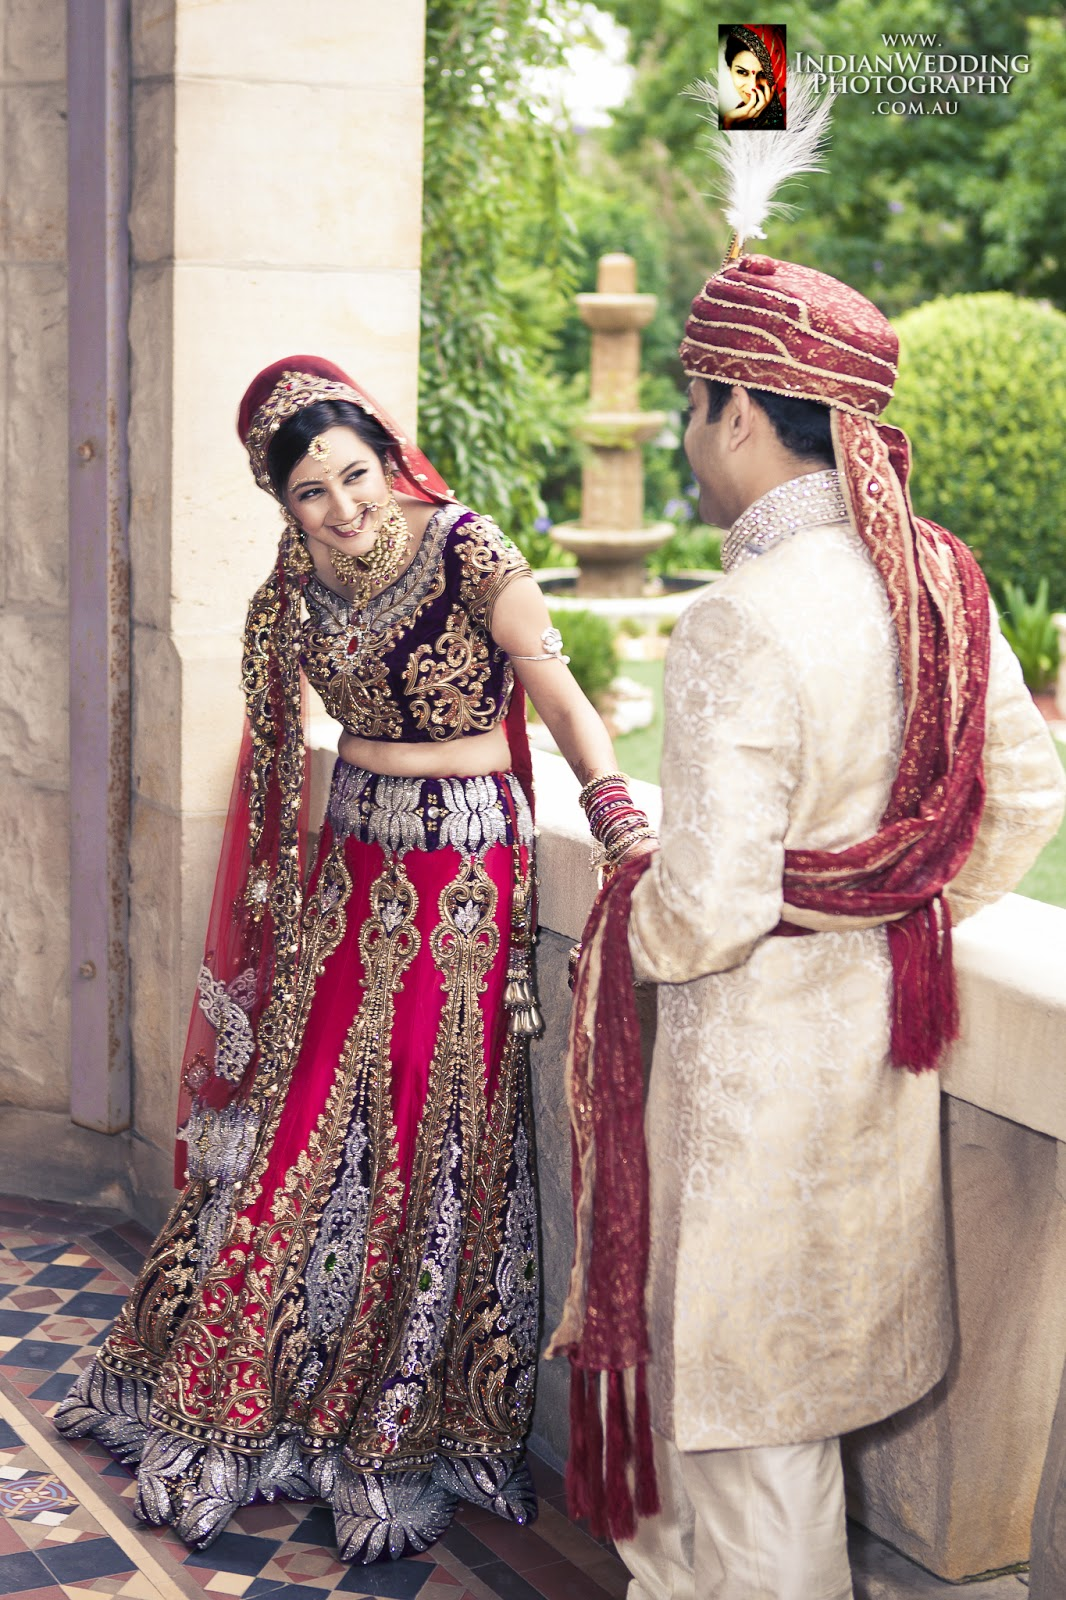 Indian Hindu Wedding At Curzon Hall Sydney-5858